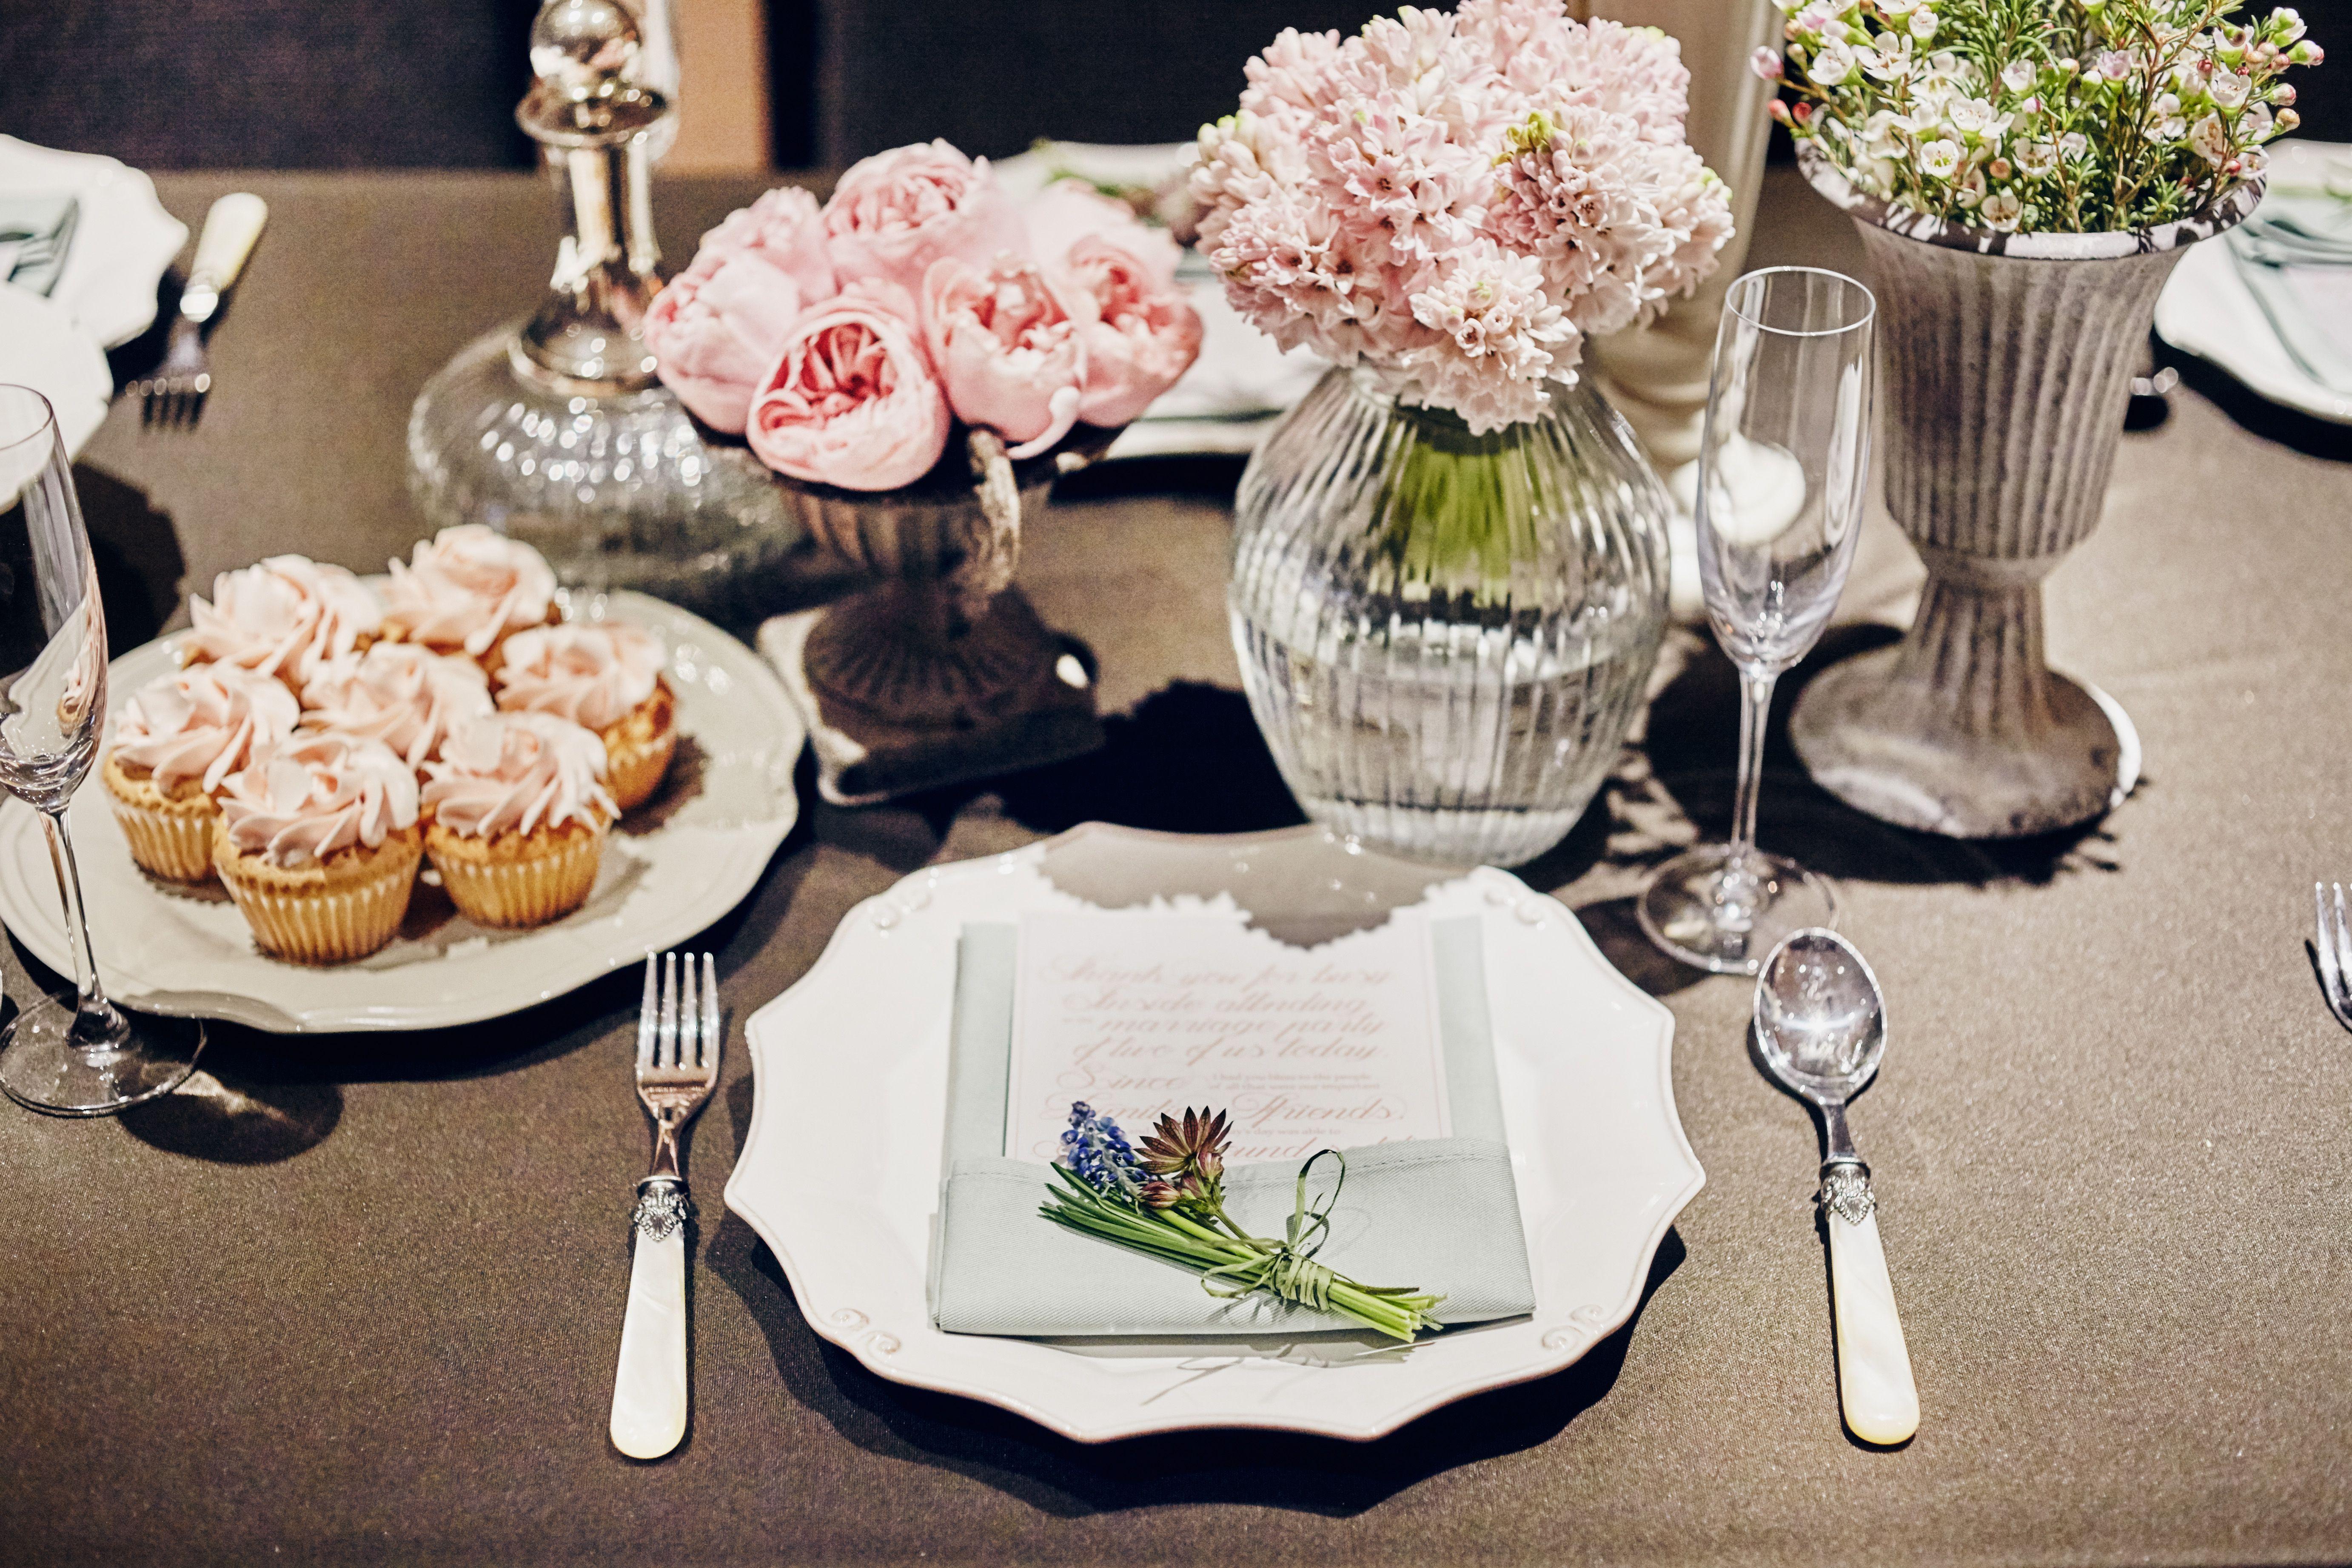 #novarese#VressetRose #Wedding #pink #tablecoordinate#smokypink #natural #Flower #Bridal #ノバレーゼ#ブレスエットロゼ #ウエディング# ピンク #スモーキーピンク #シンプル#ゲストテーブル  #テーブルコーディネート # ブライダル#結婚式